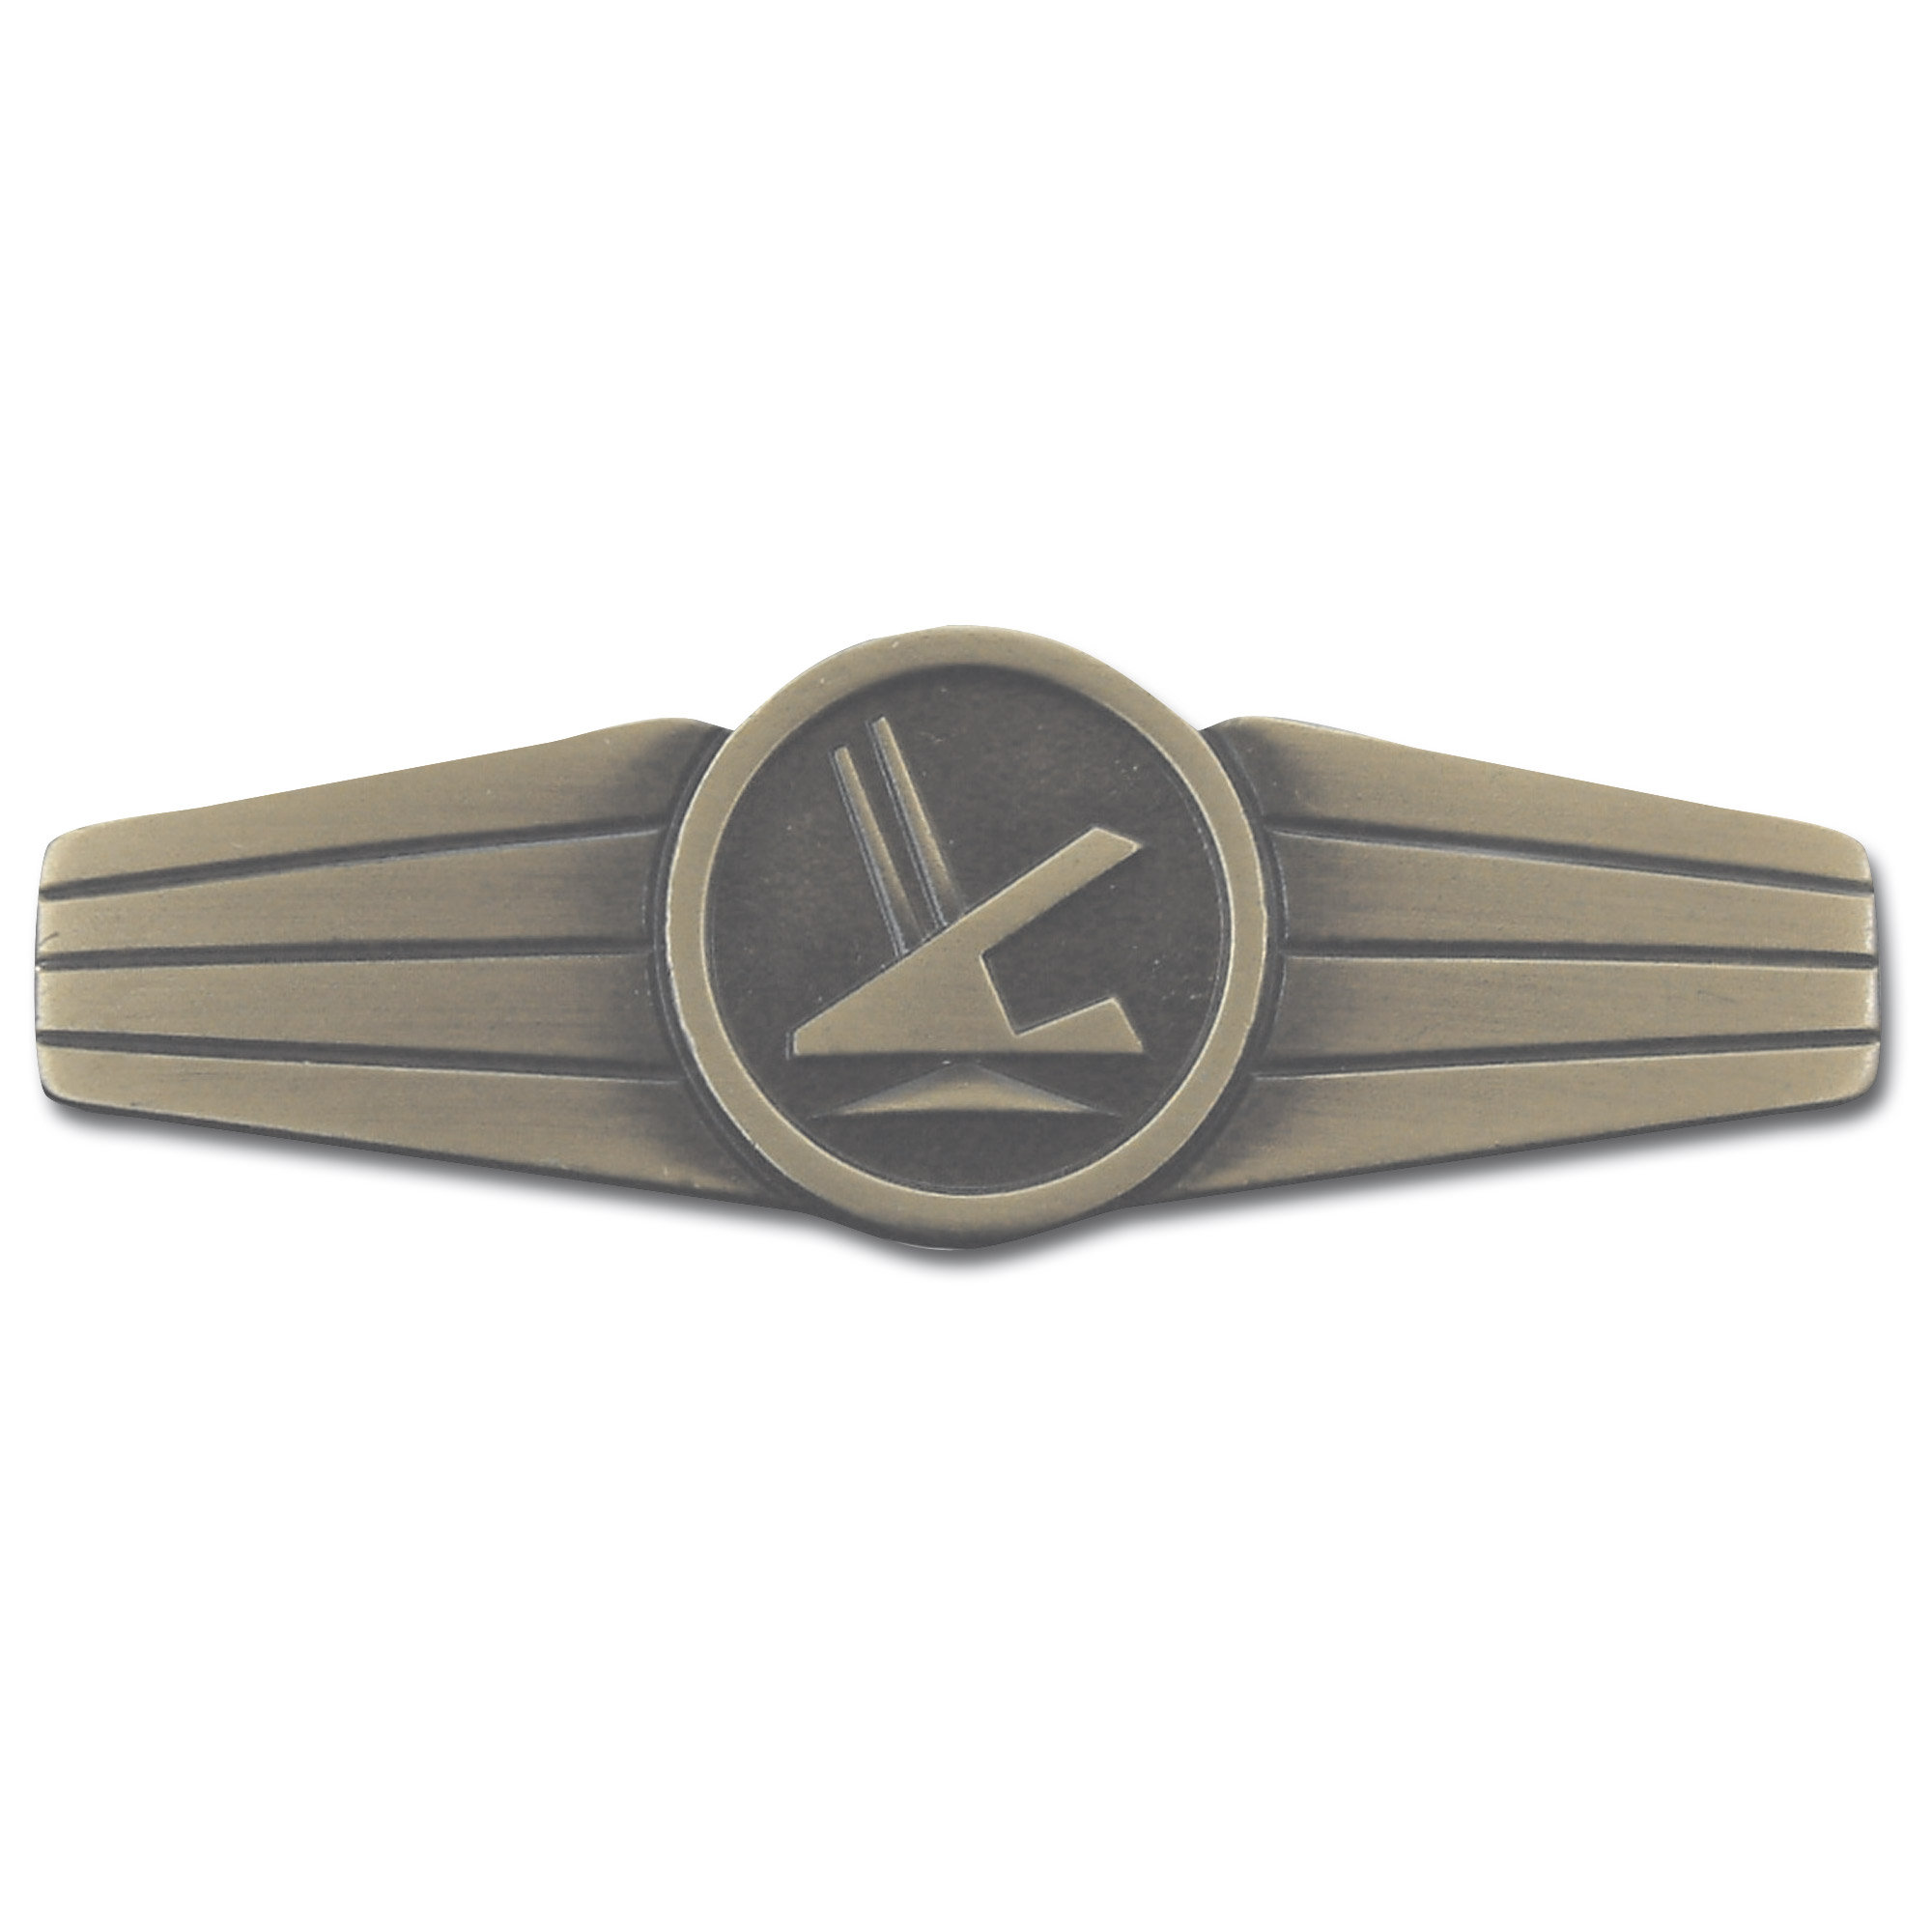 Abz. BW Sicherungspersonal Metall bronze (alt)